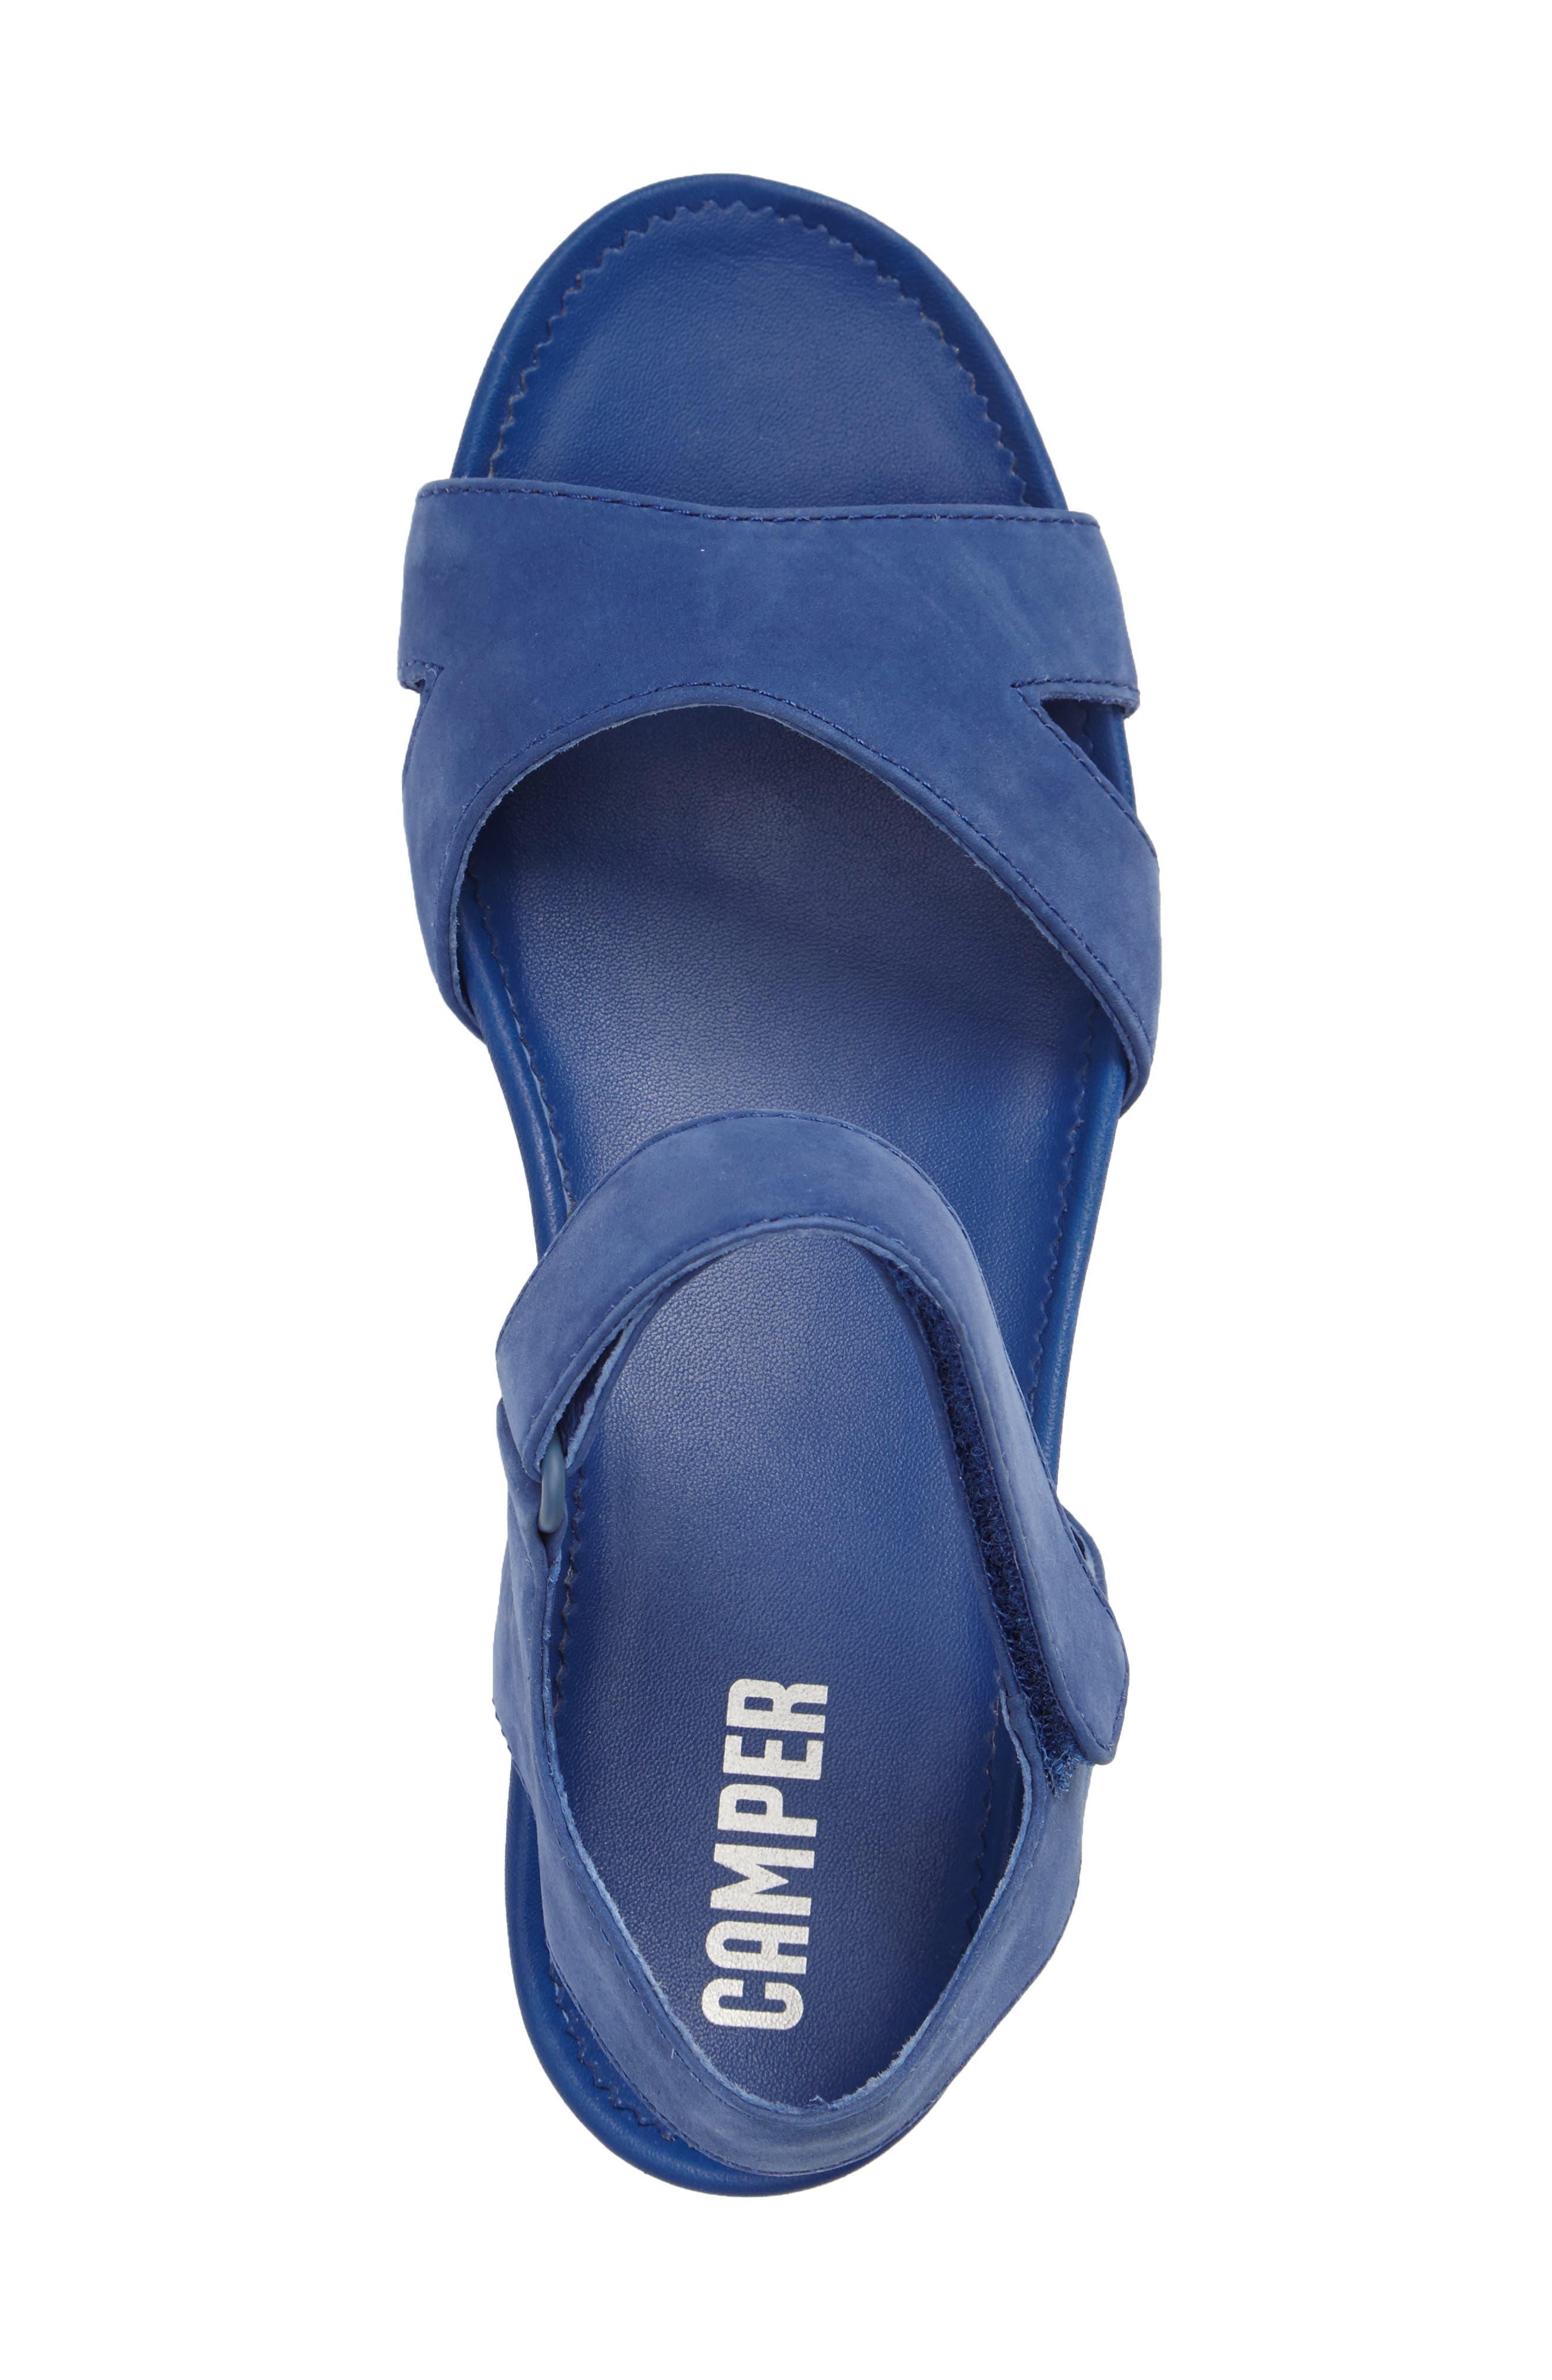 'Micro' Sandal,                             Alternate thumbnail 3, color,                             Blue Leather